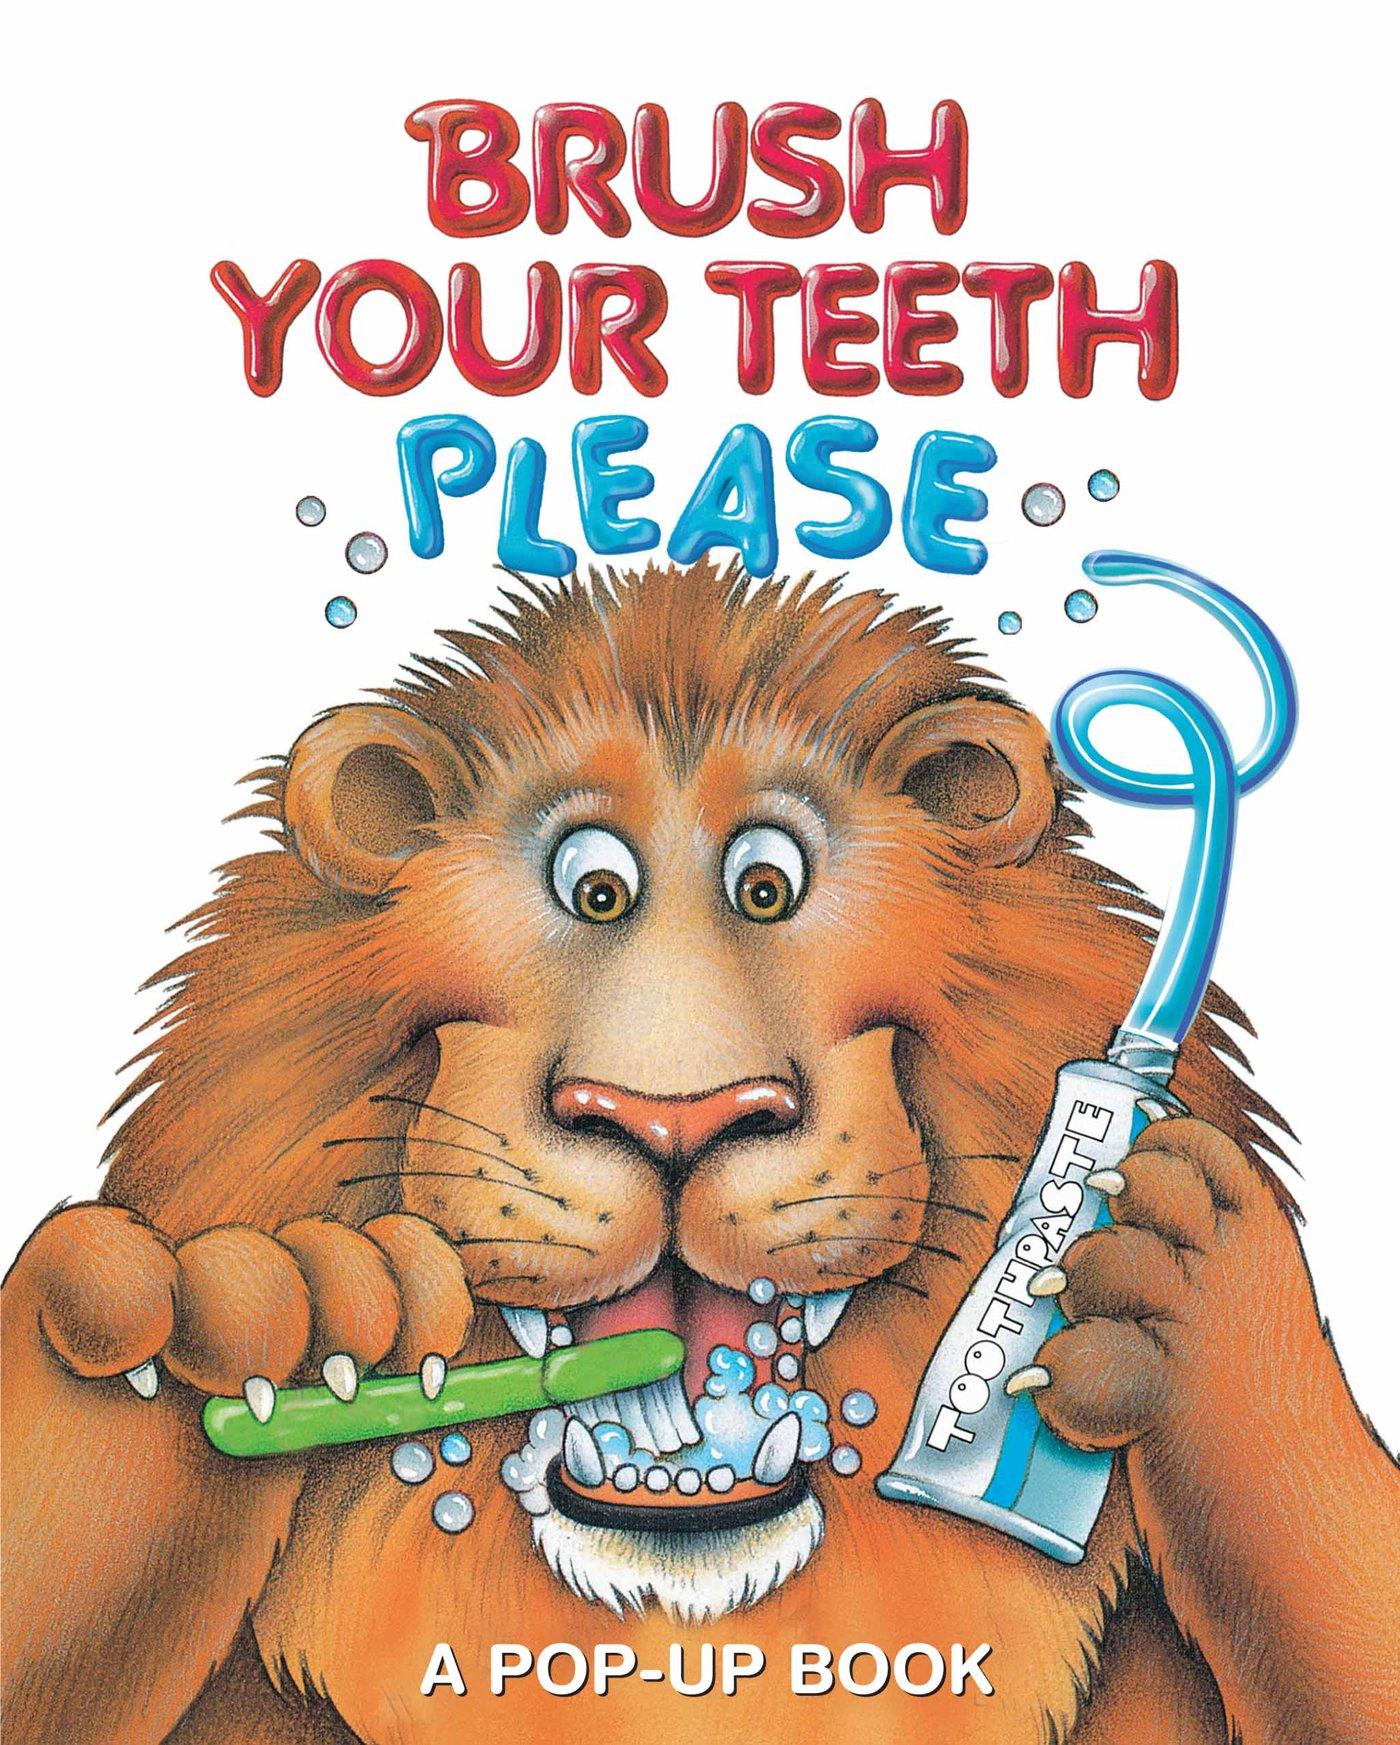 Amazon.com: Brush Your Teeth, Please: A Pop-up Book (2) (9780794430405):  Pidgeon, Jean: Books